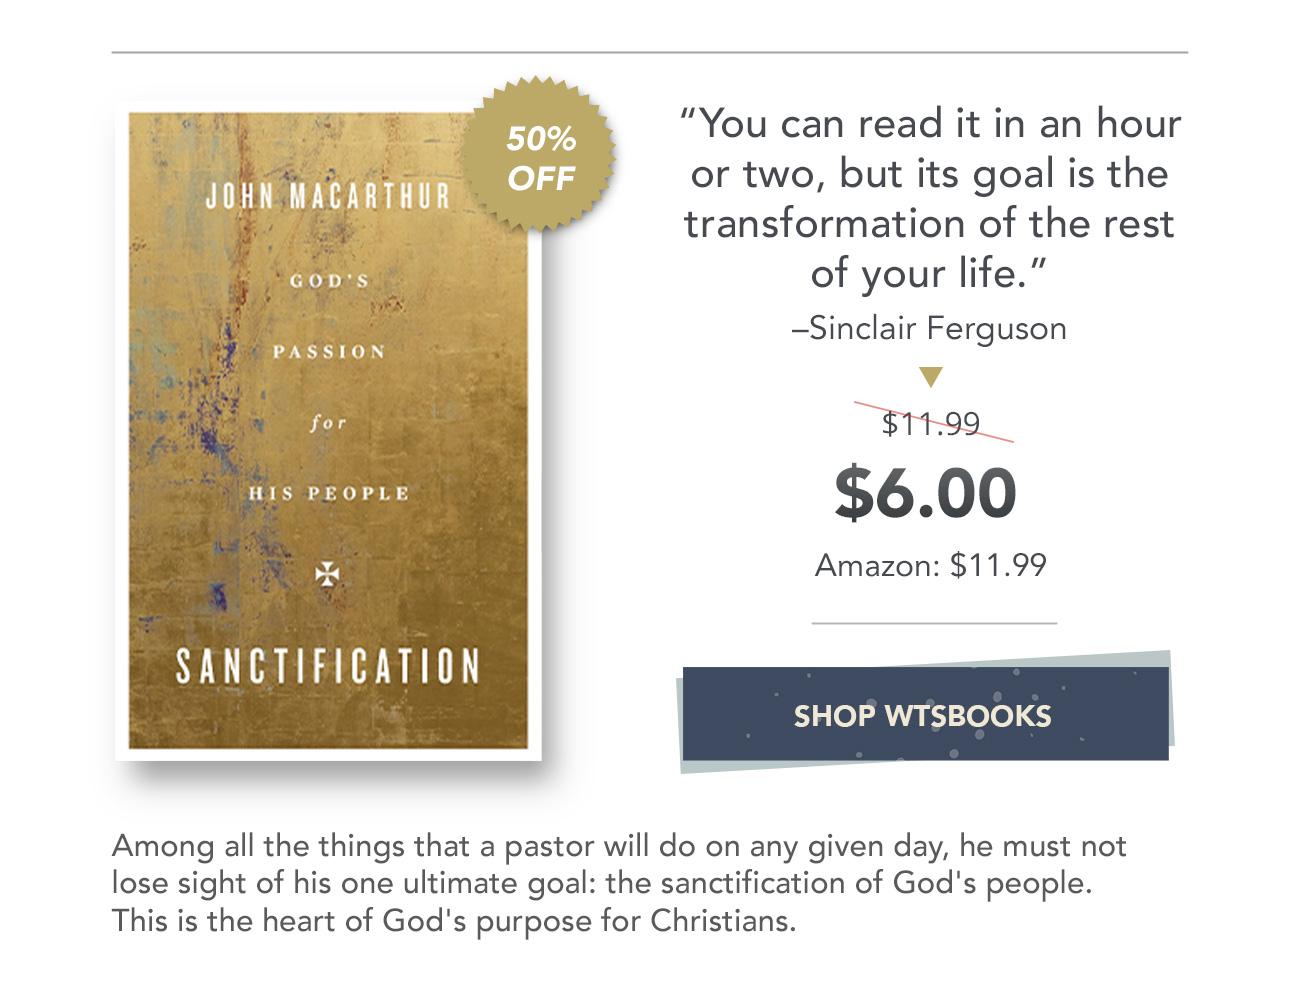 Sanctification, John MacArthur